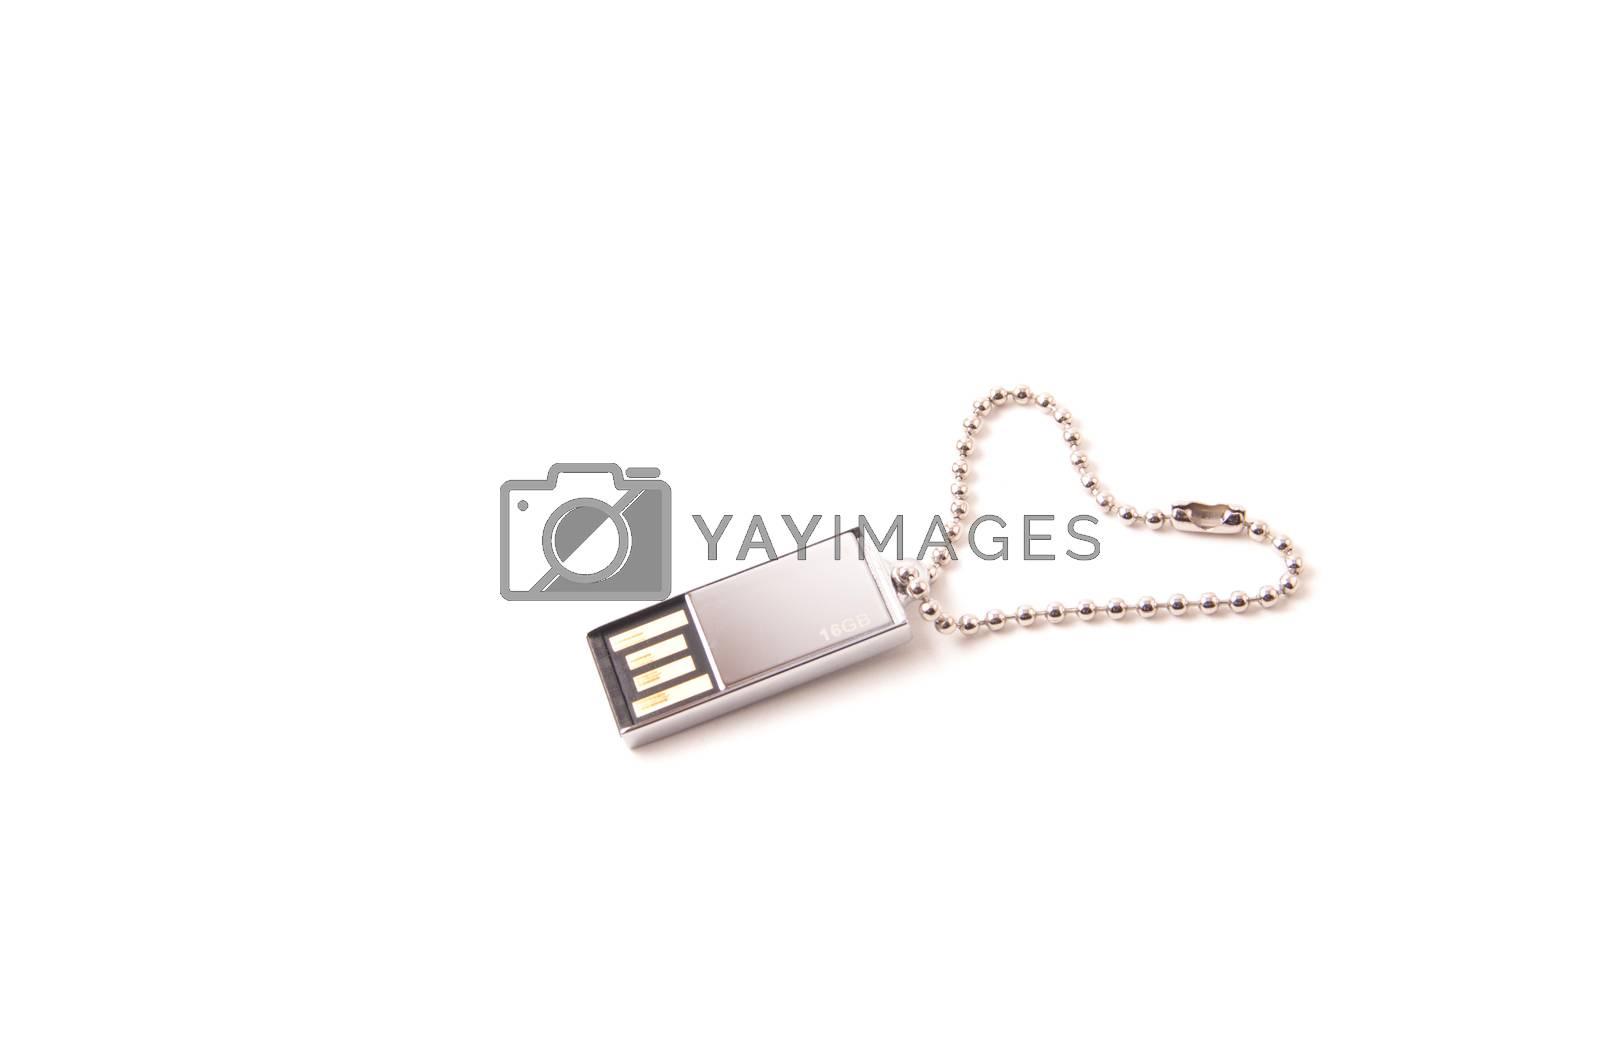 Platinum USB key with heart shape chain